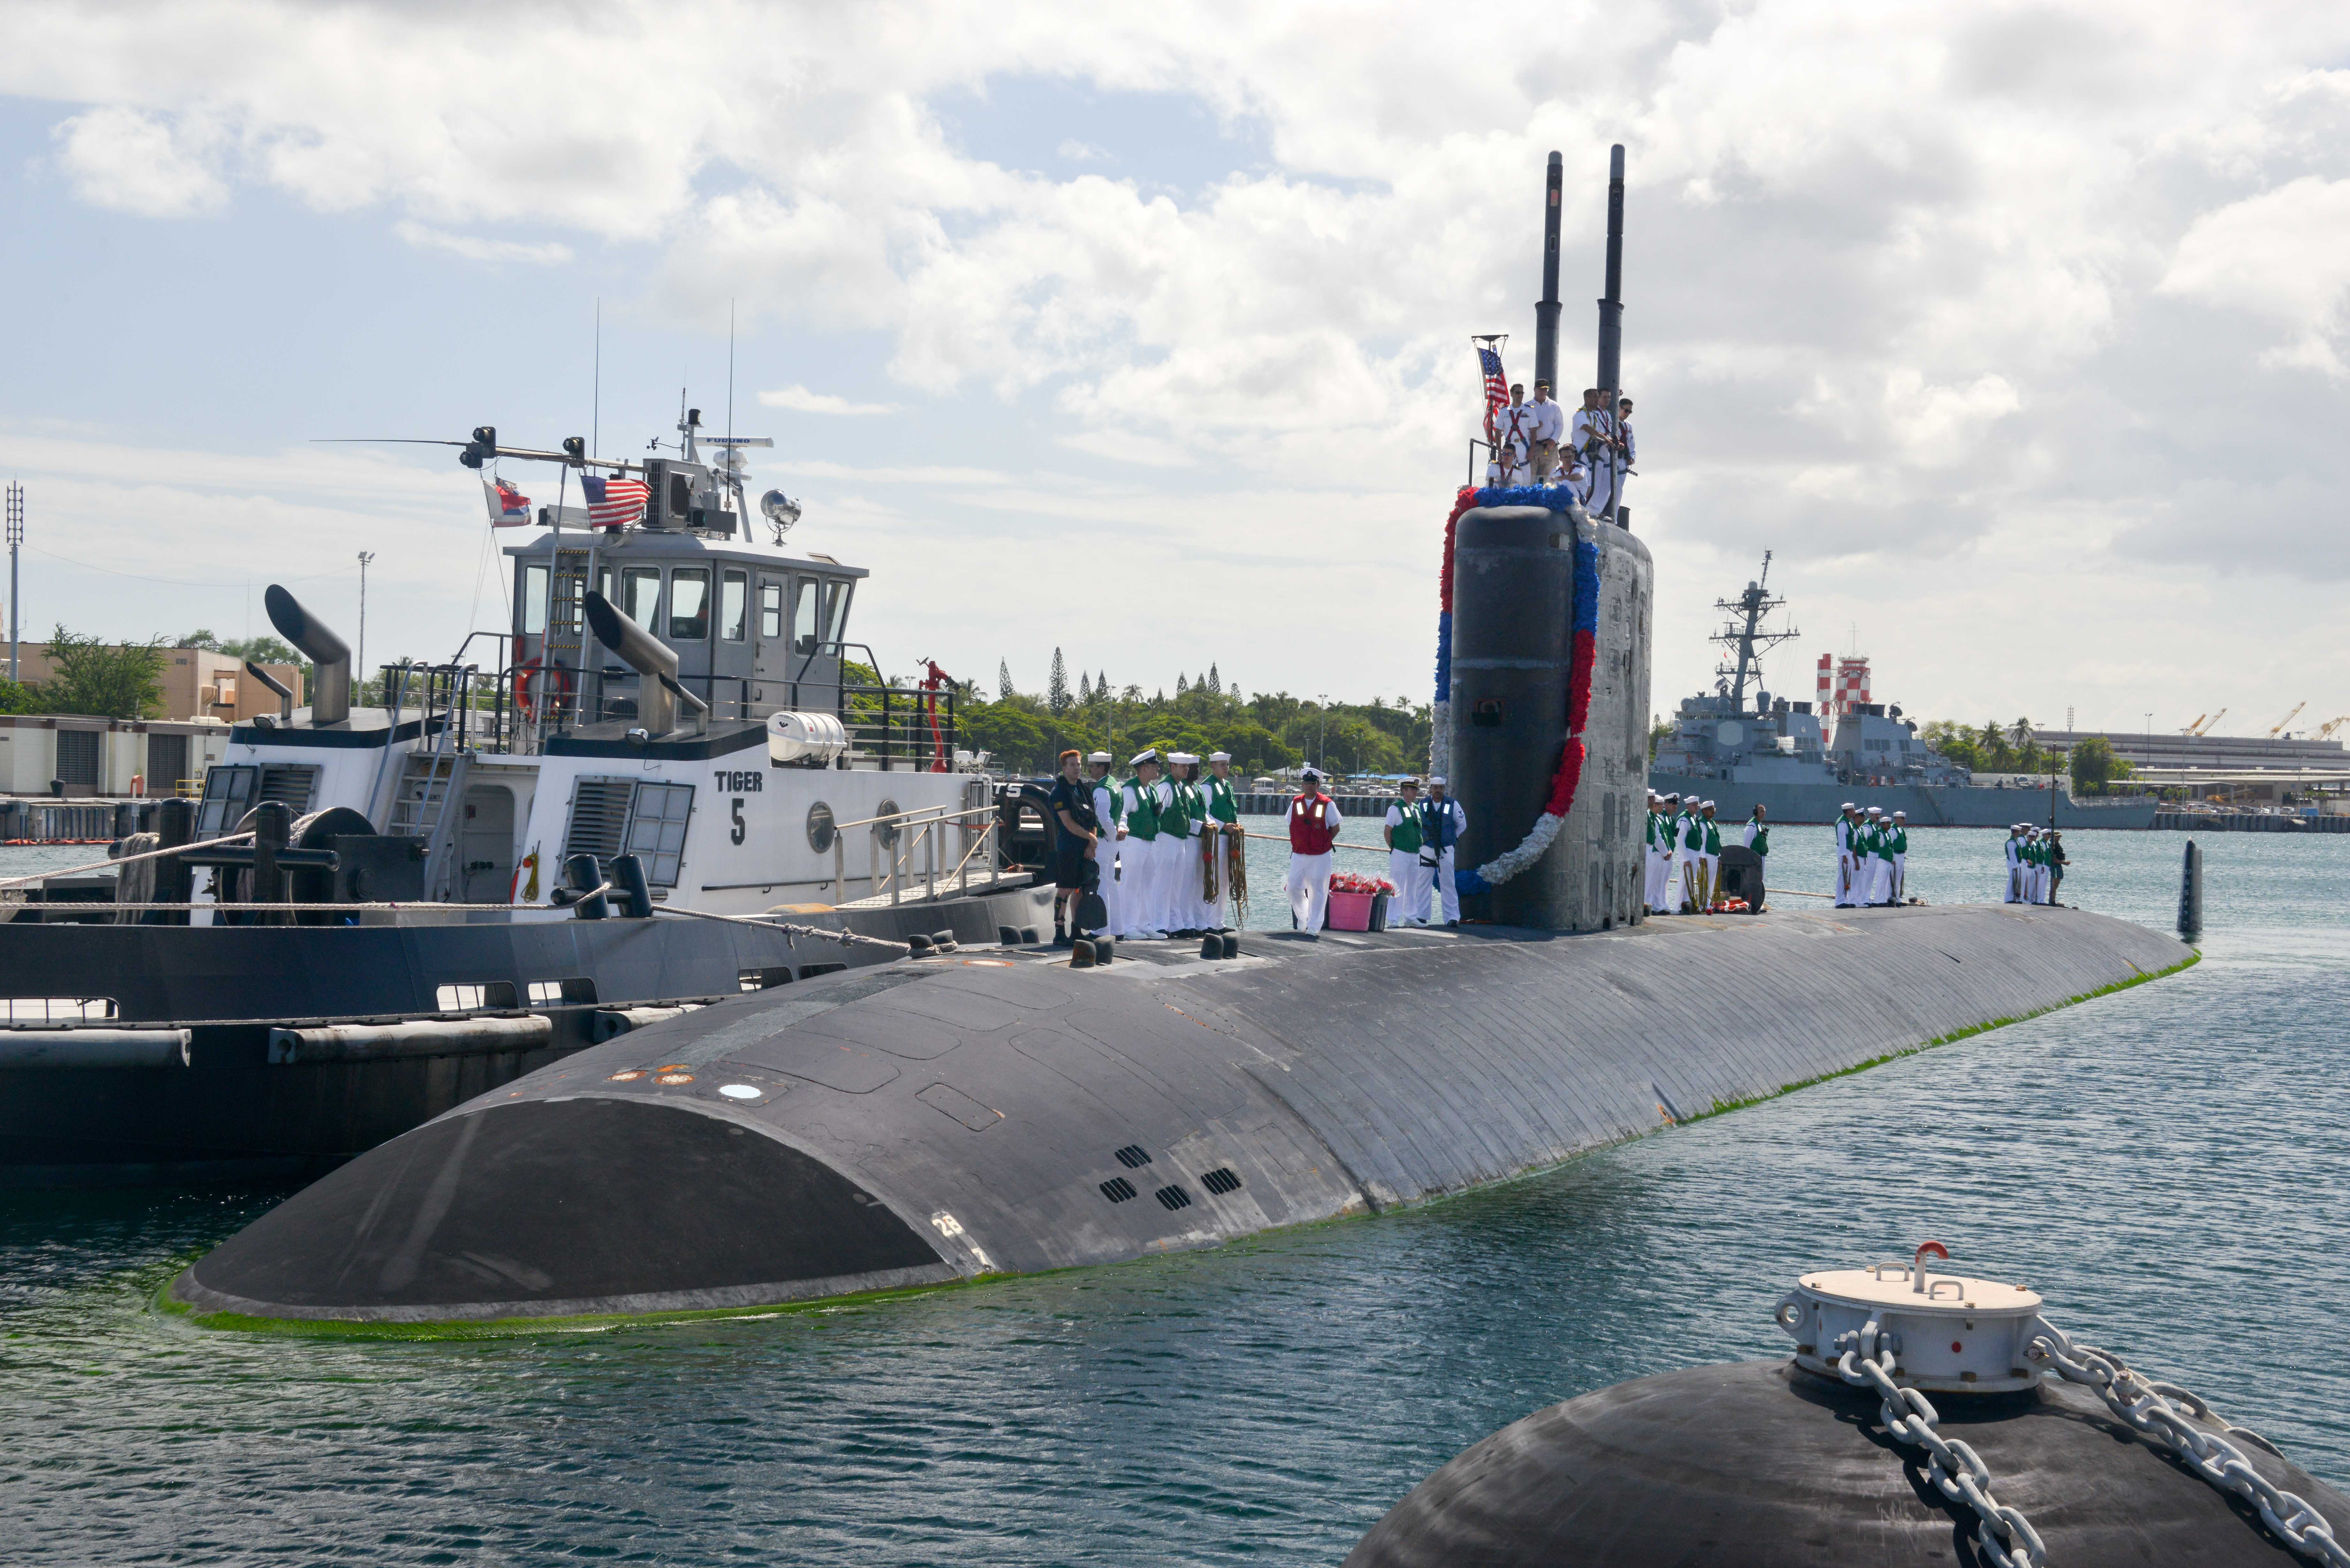 USS COLUMBUS SSN-762 Einlaufen Pearl Harbor am 11.08.2015 Bild: U.S. Navy